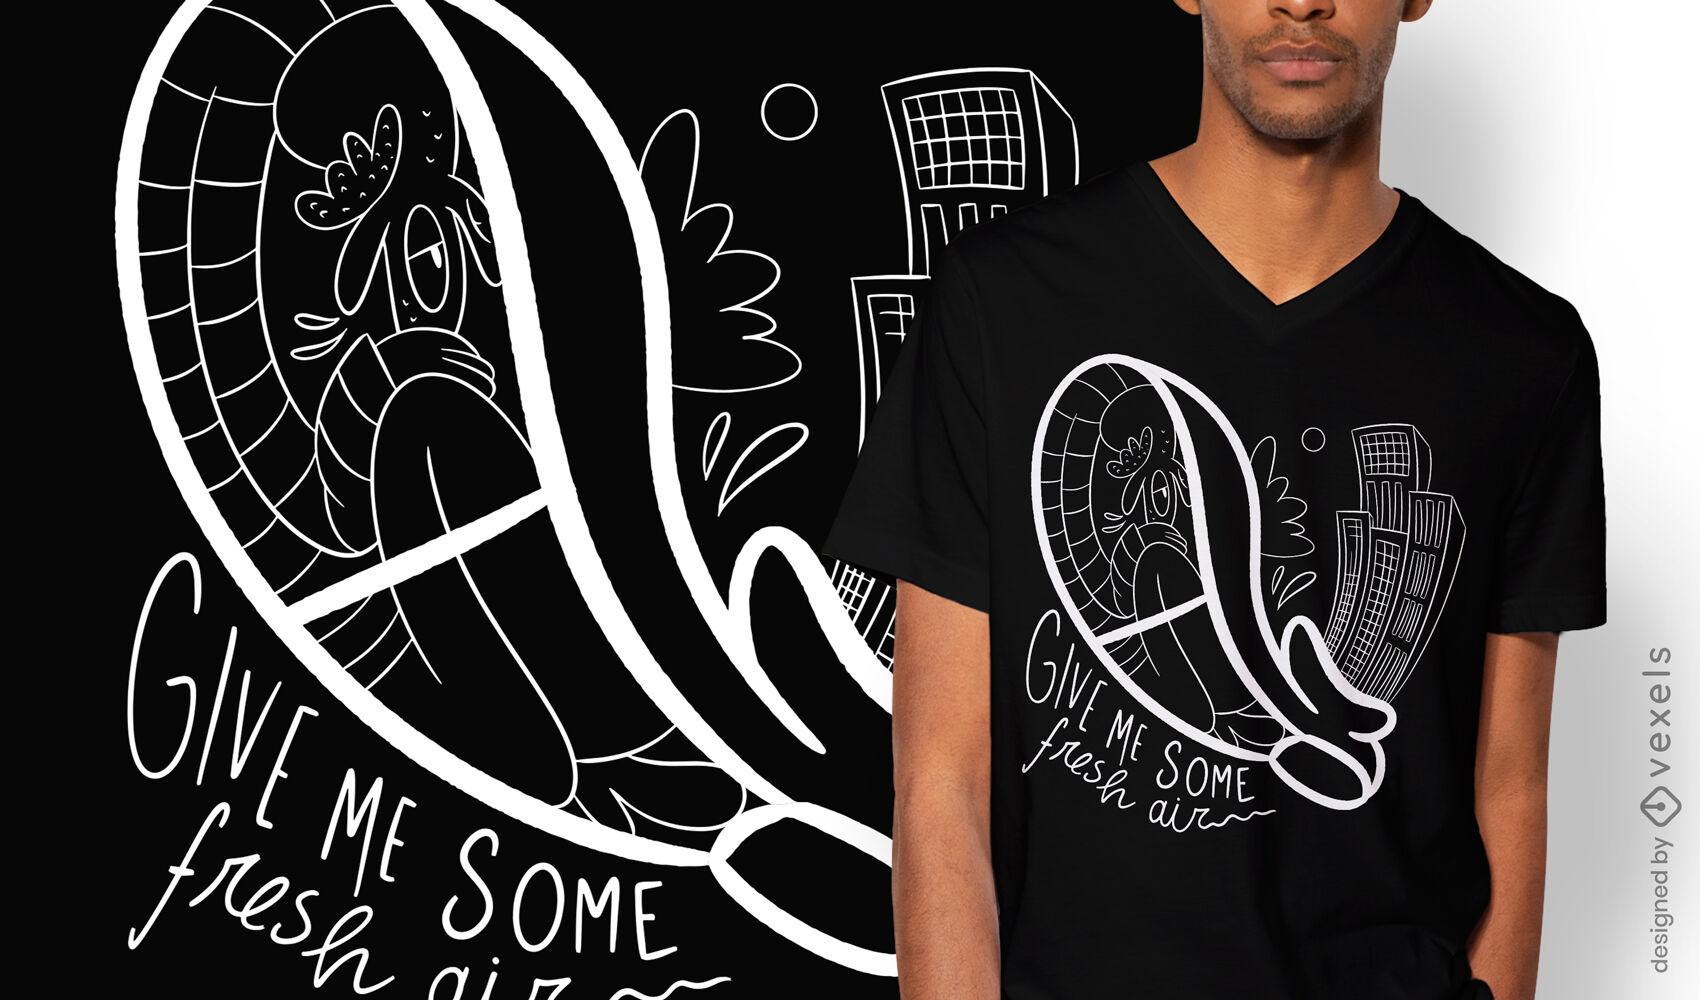 Claustrophobia in shoe t-shirt design